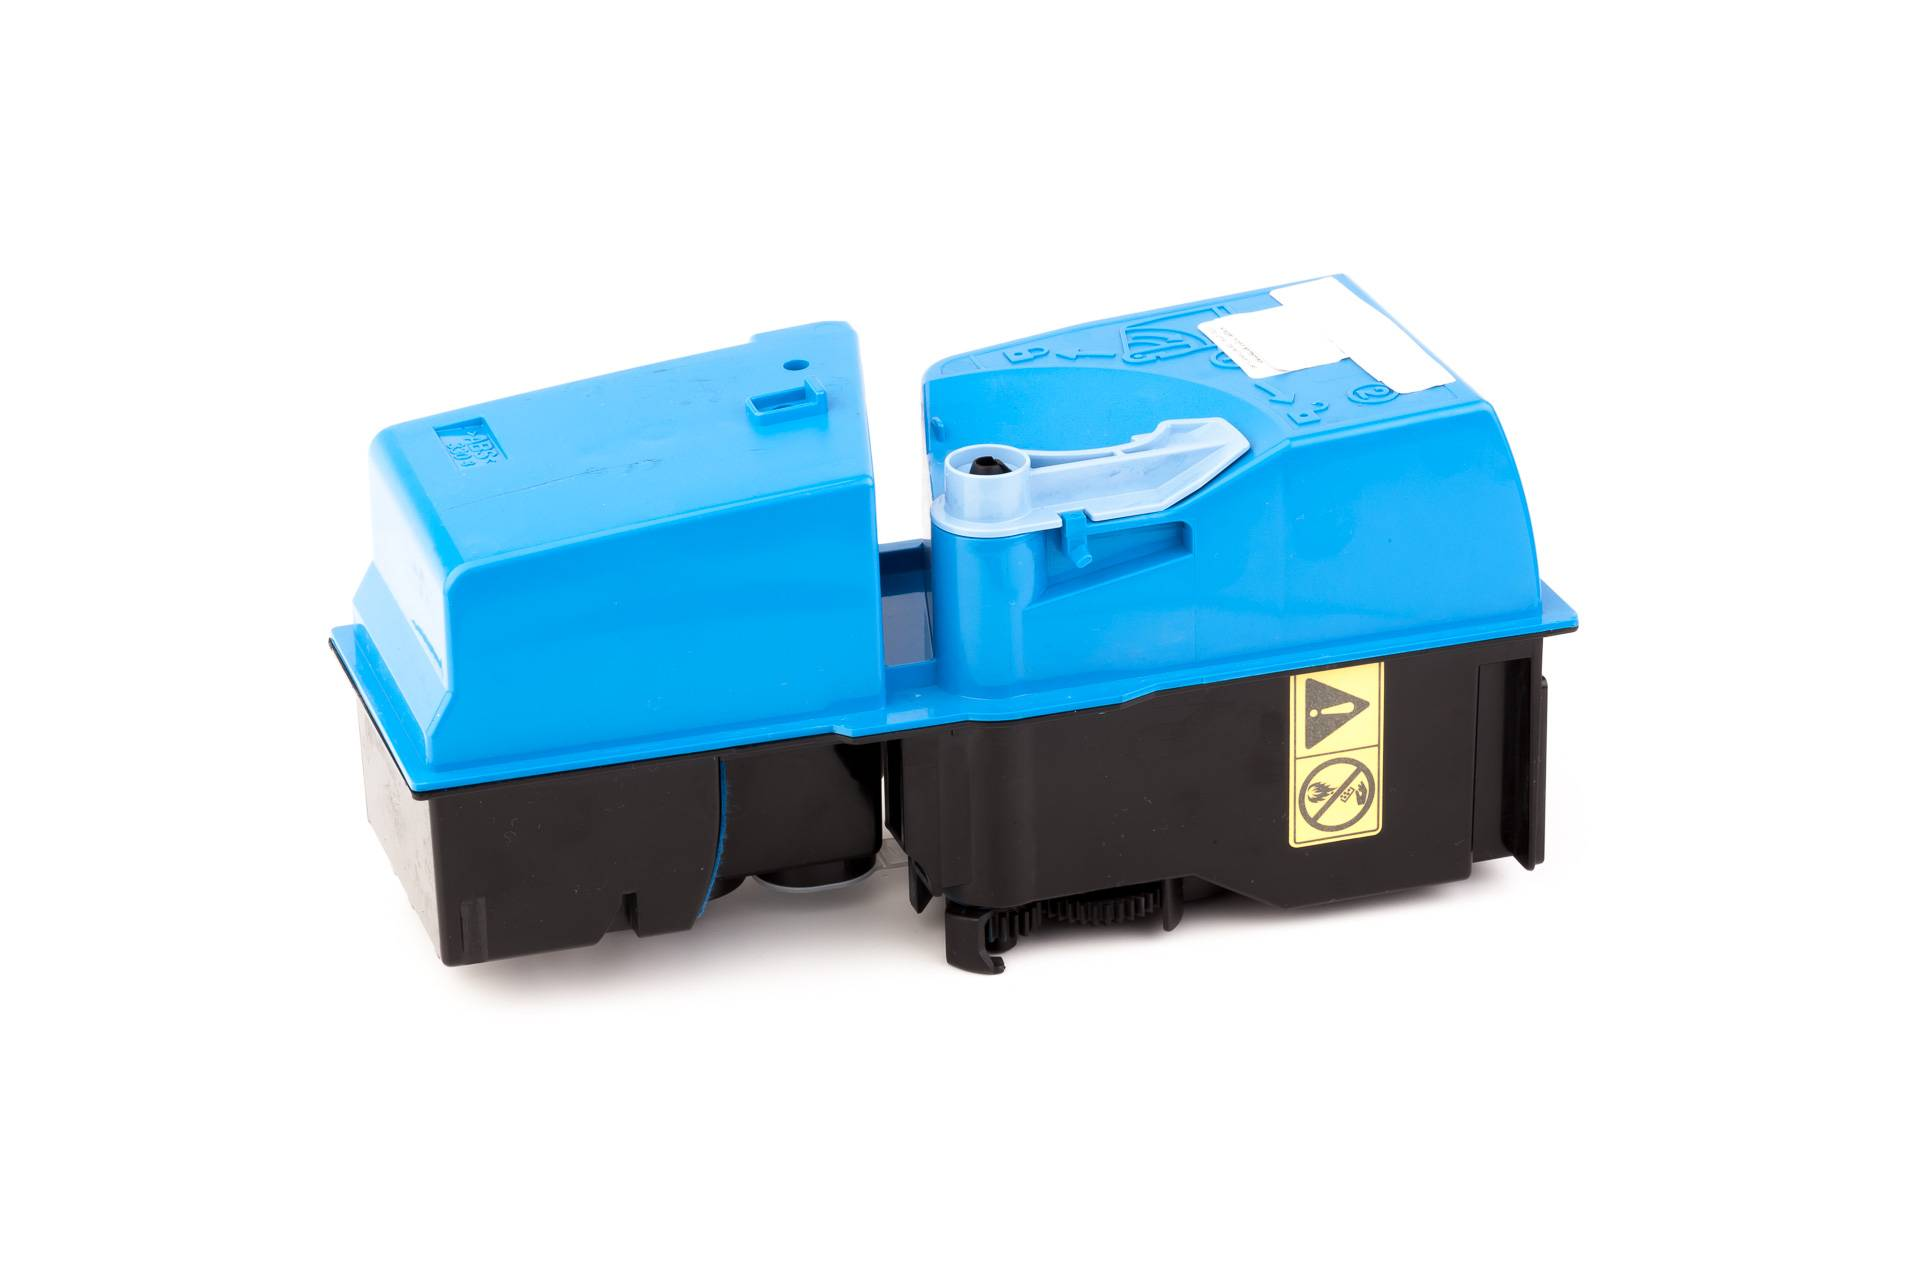 Kyocera Cartouche de Toner pour Kyocera 1T02FZCEU0 / TK-825 C cyan compatible (de marque ASC)